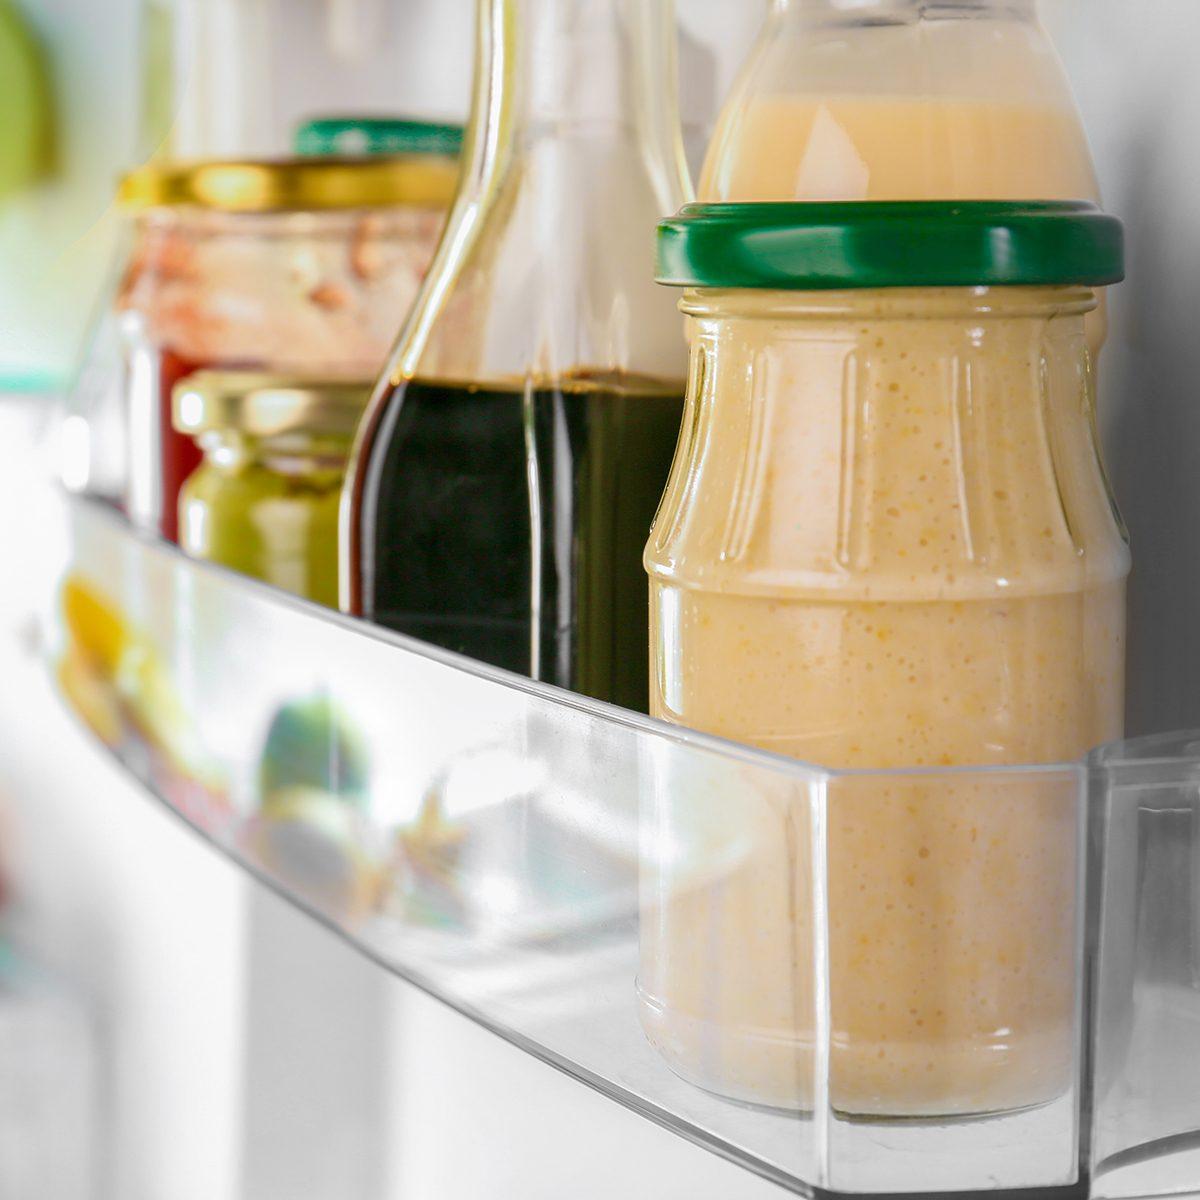 Different sauces on shelf in fridge